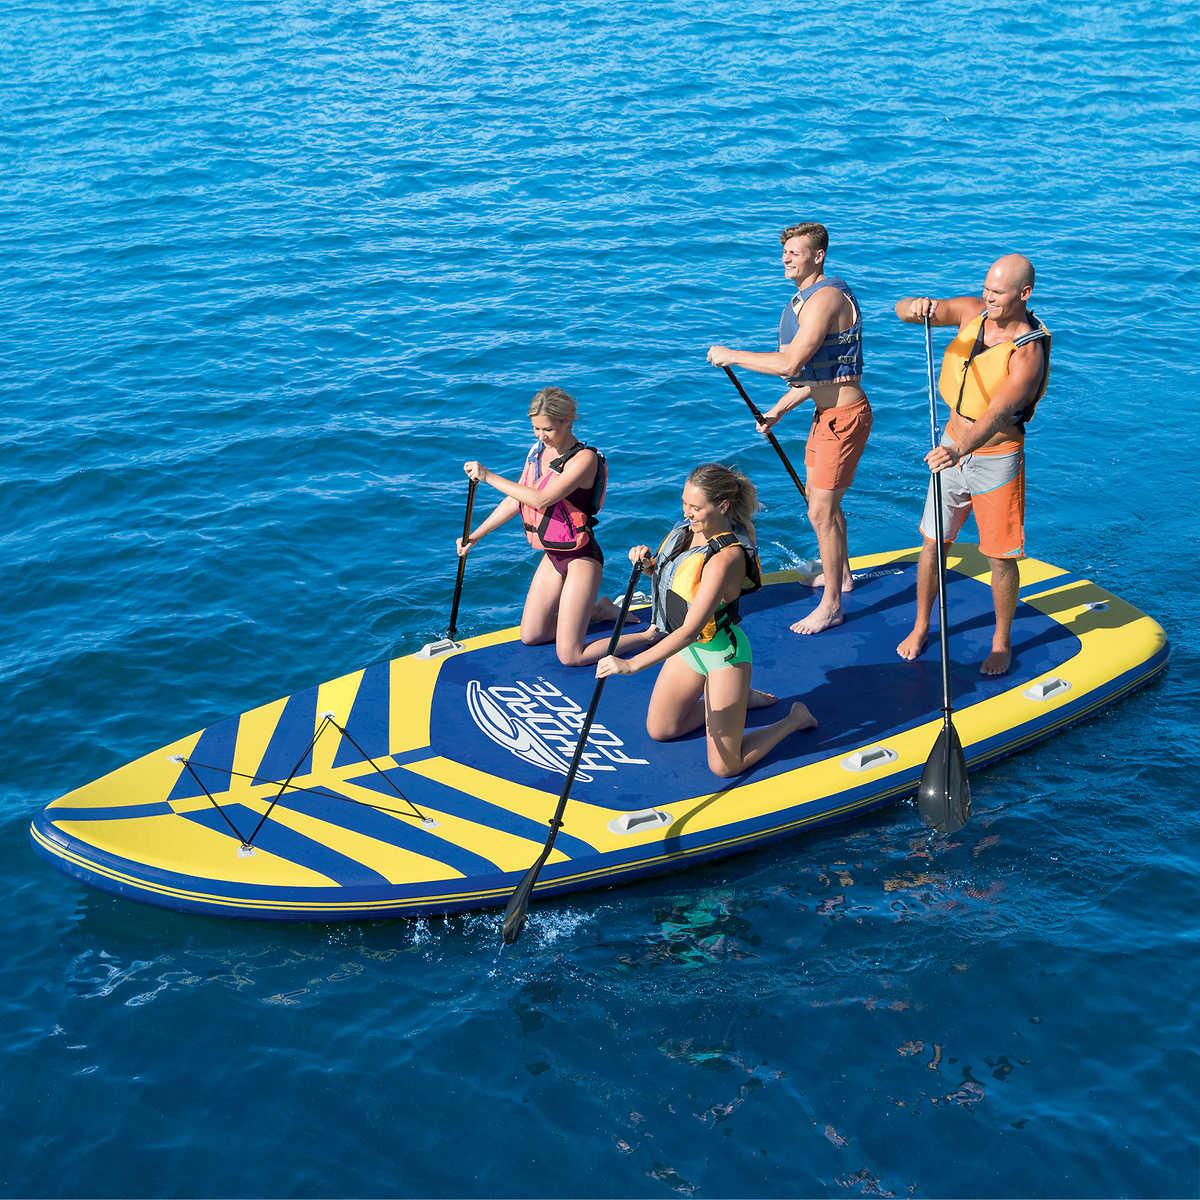 Kayak Build Kit For Kids